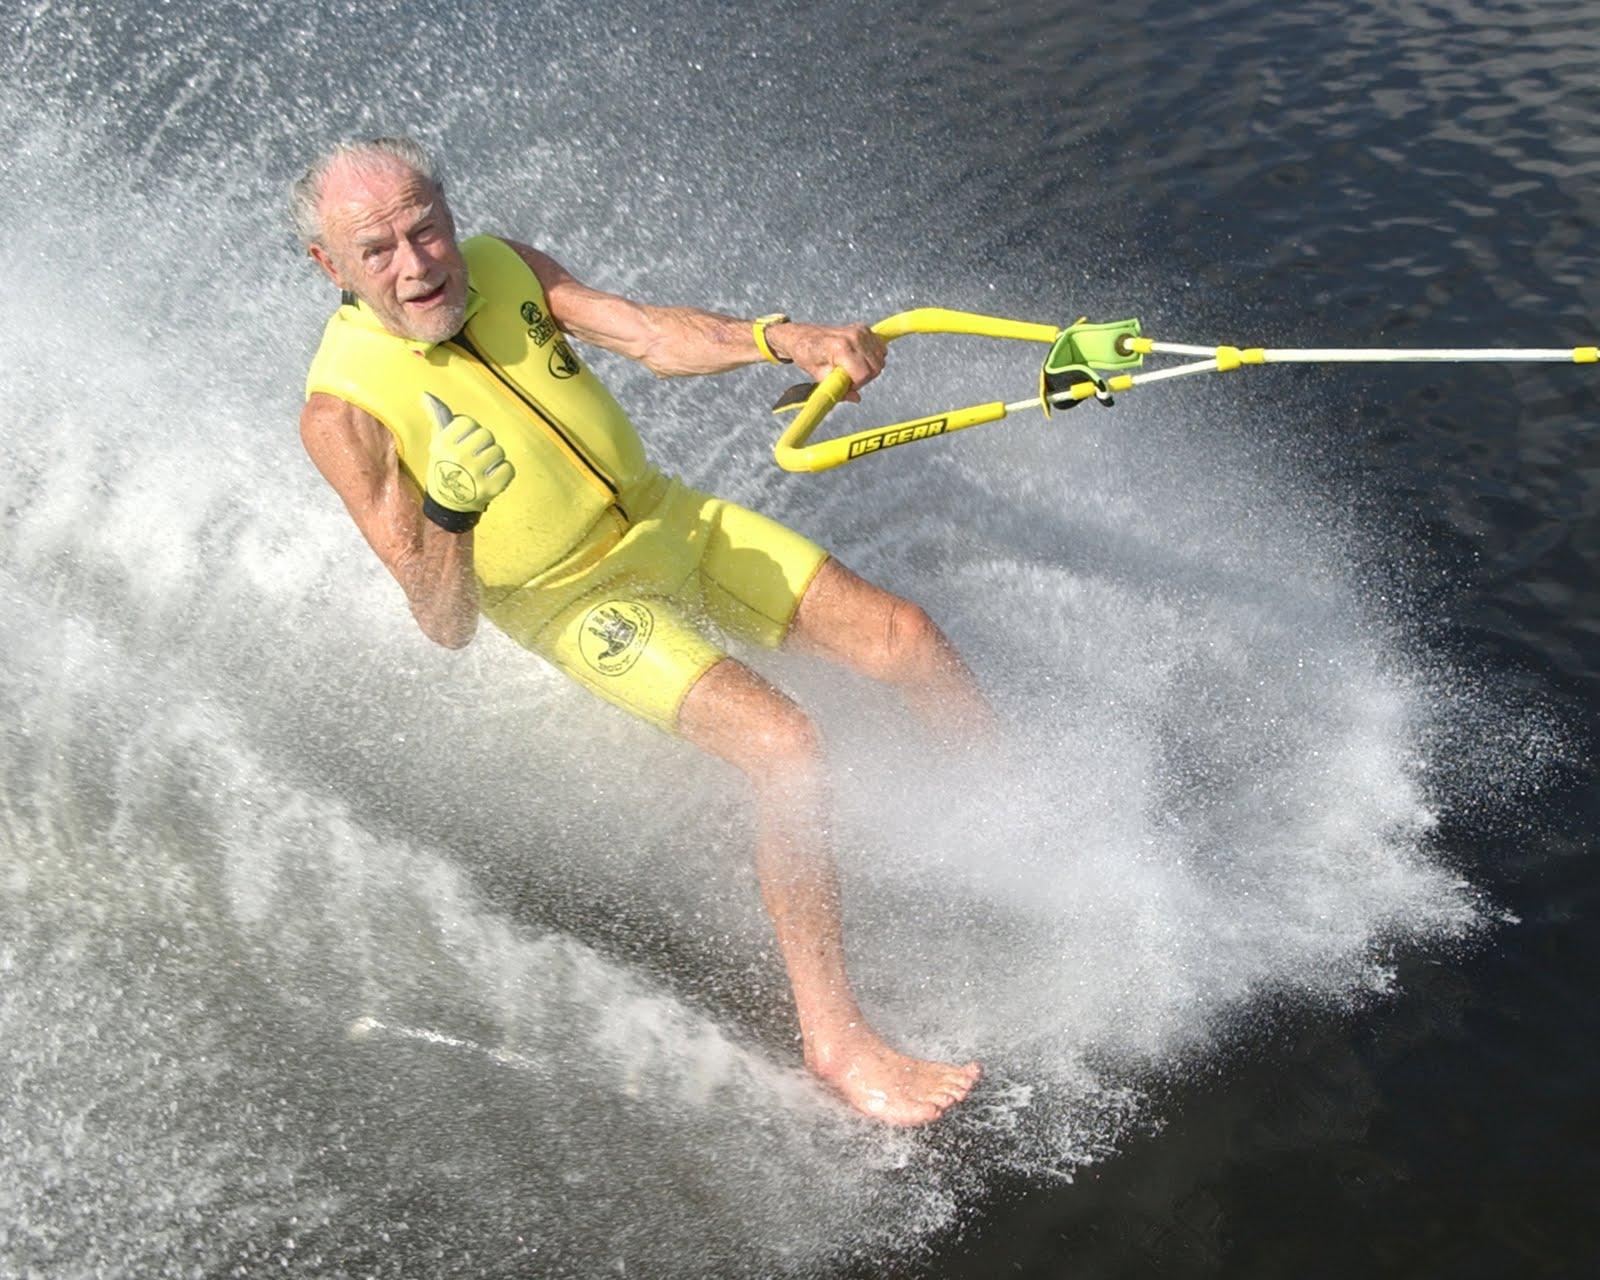 BANANA GEORGE BLAIR, 93 YEARS YOUNG, Bare foot Water Ski